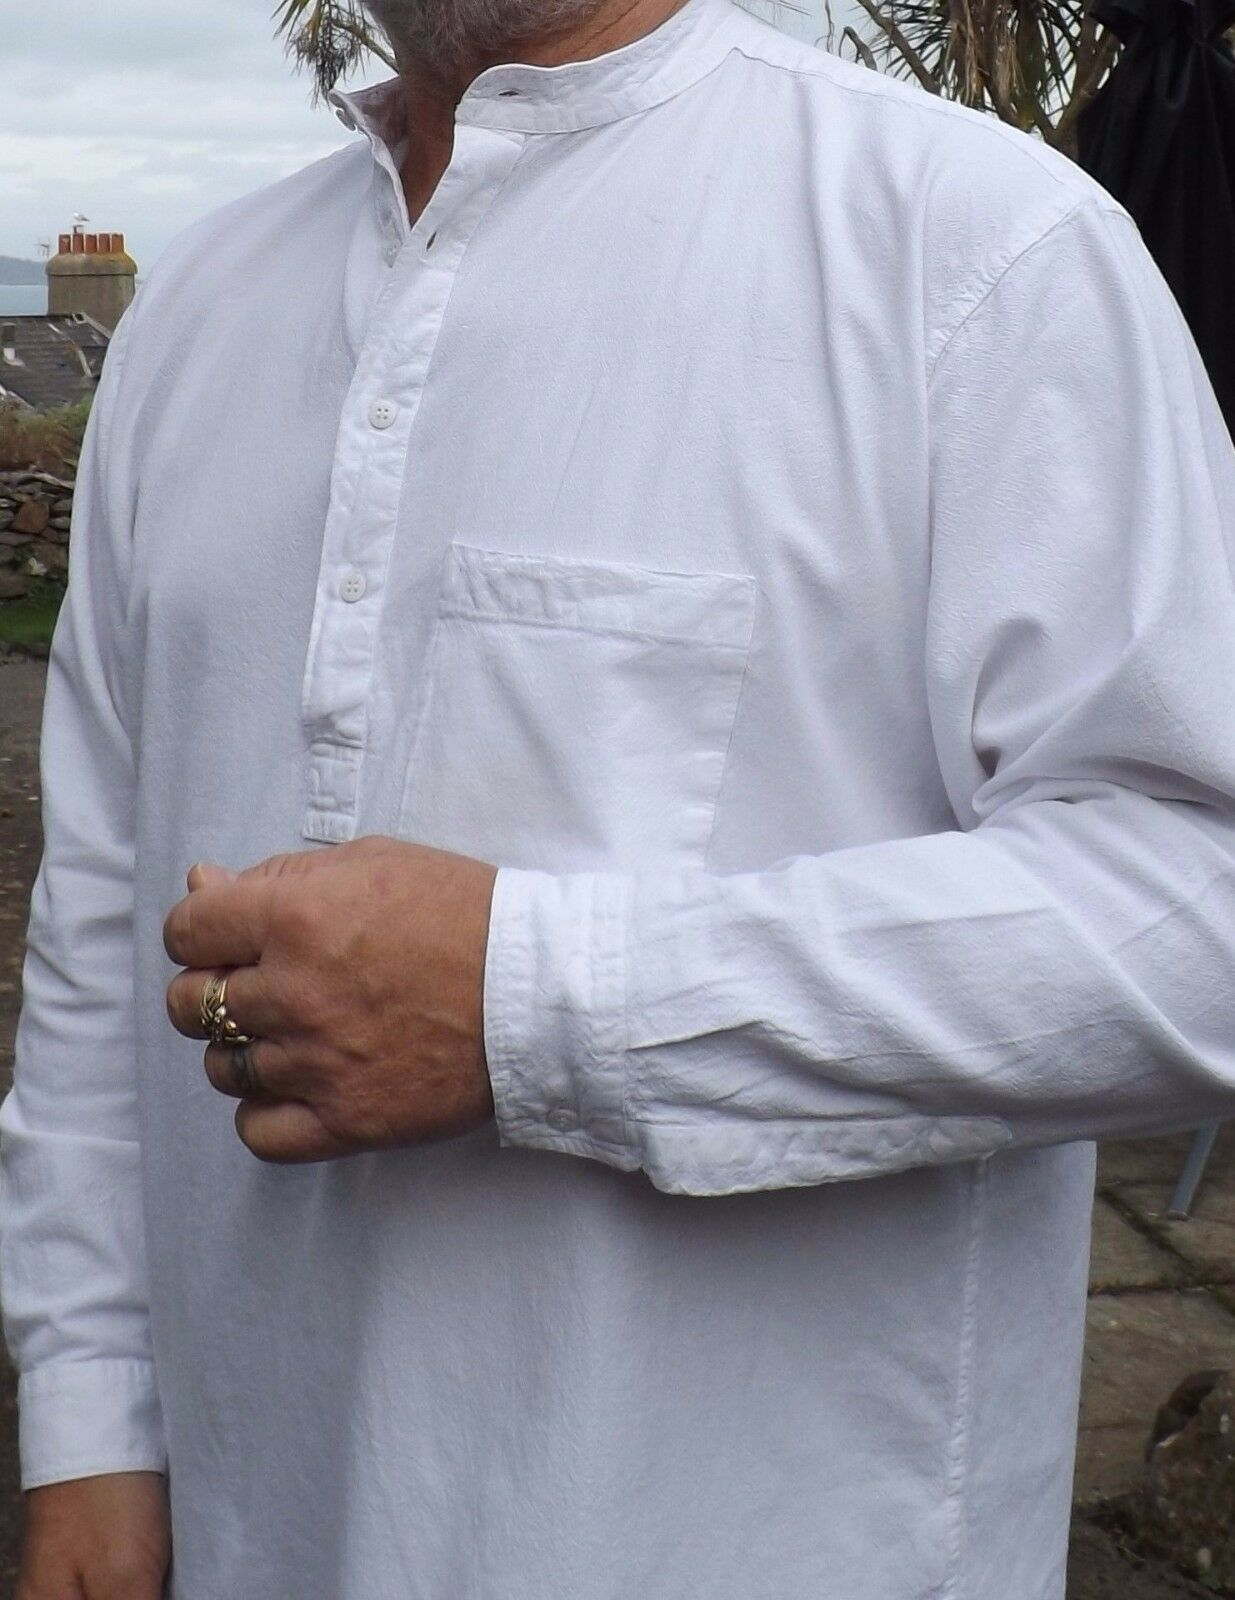 Grandad Shirt Kaboo Trading Quality Quality Quality Half Button in XXXL (fits up to 58  chest). | Großhandel  361557